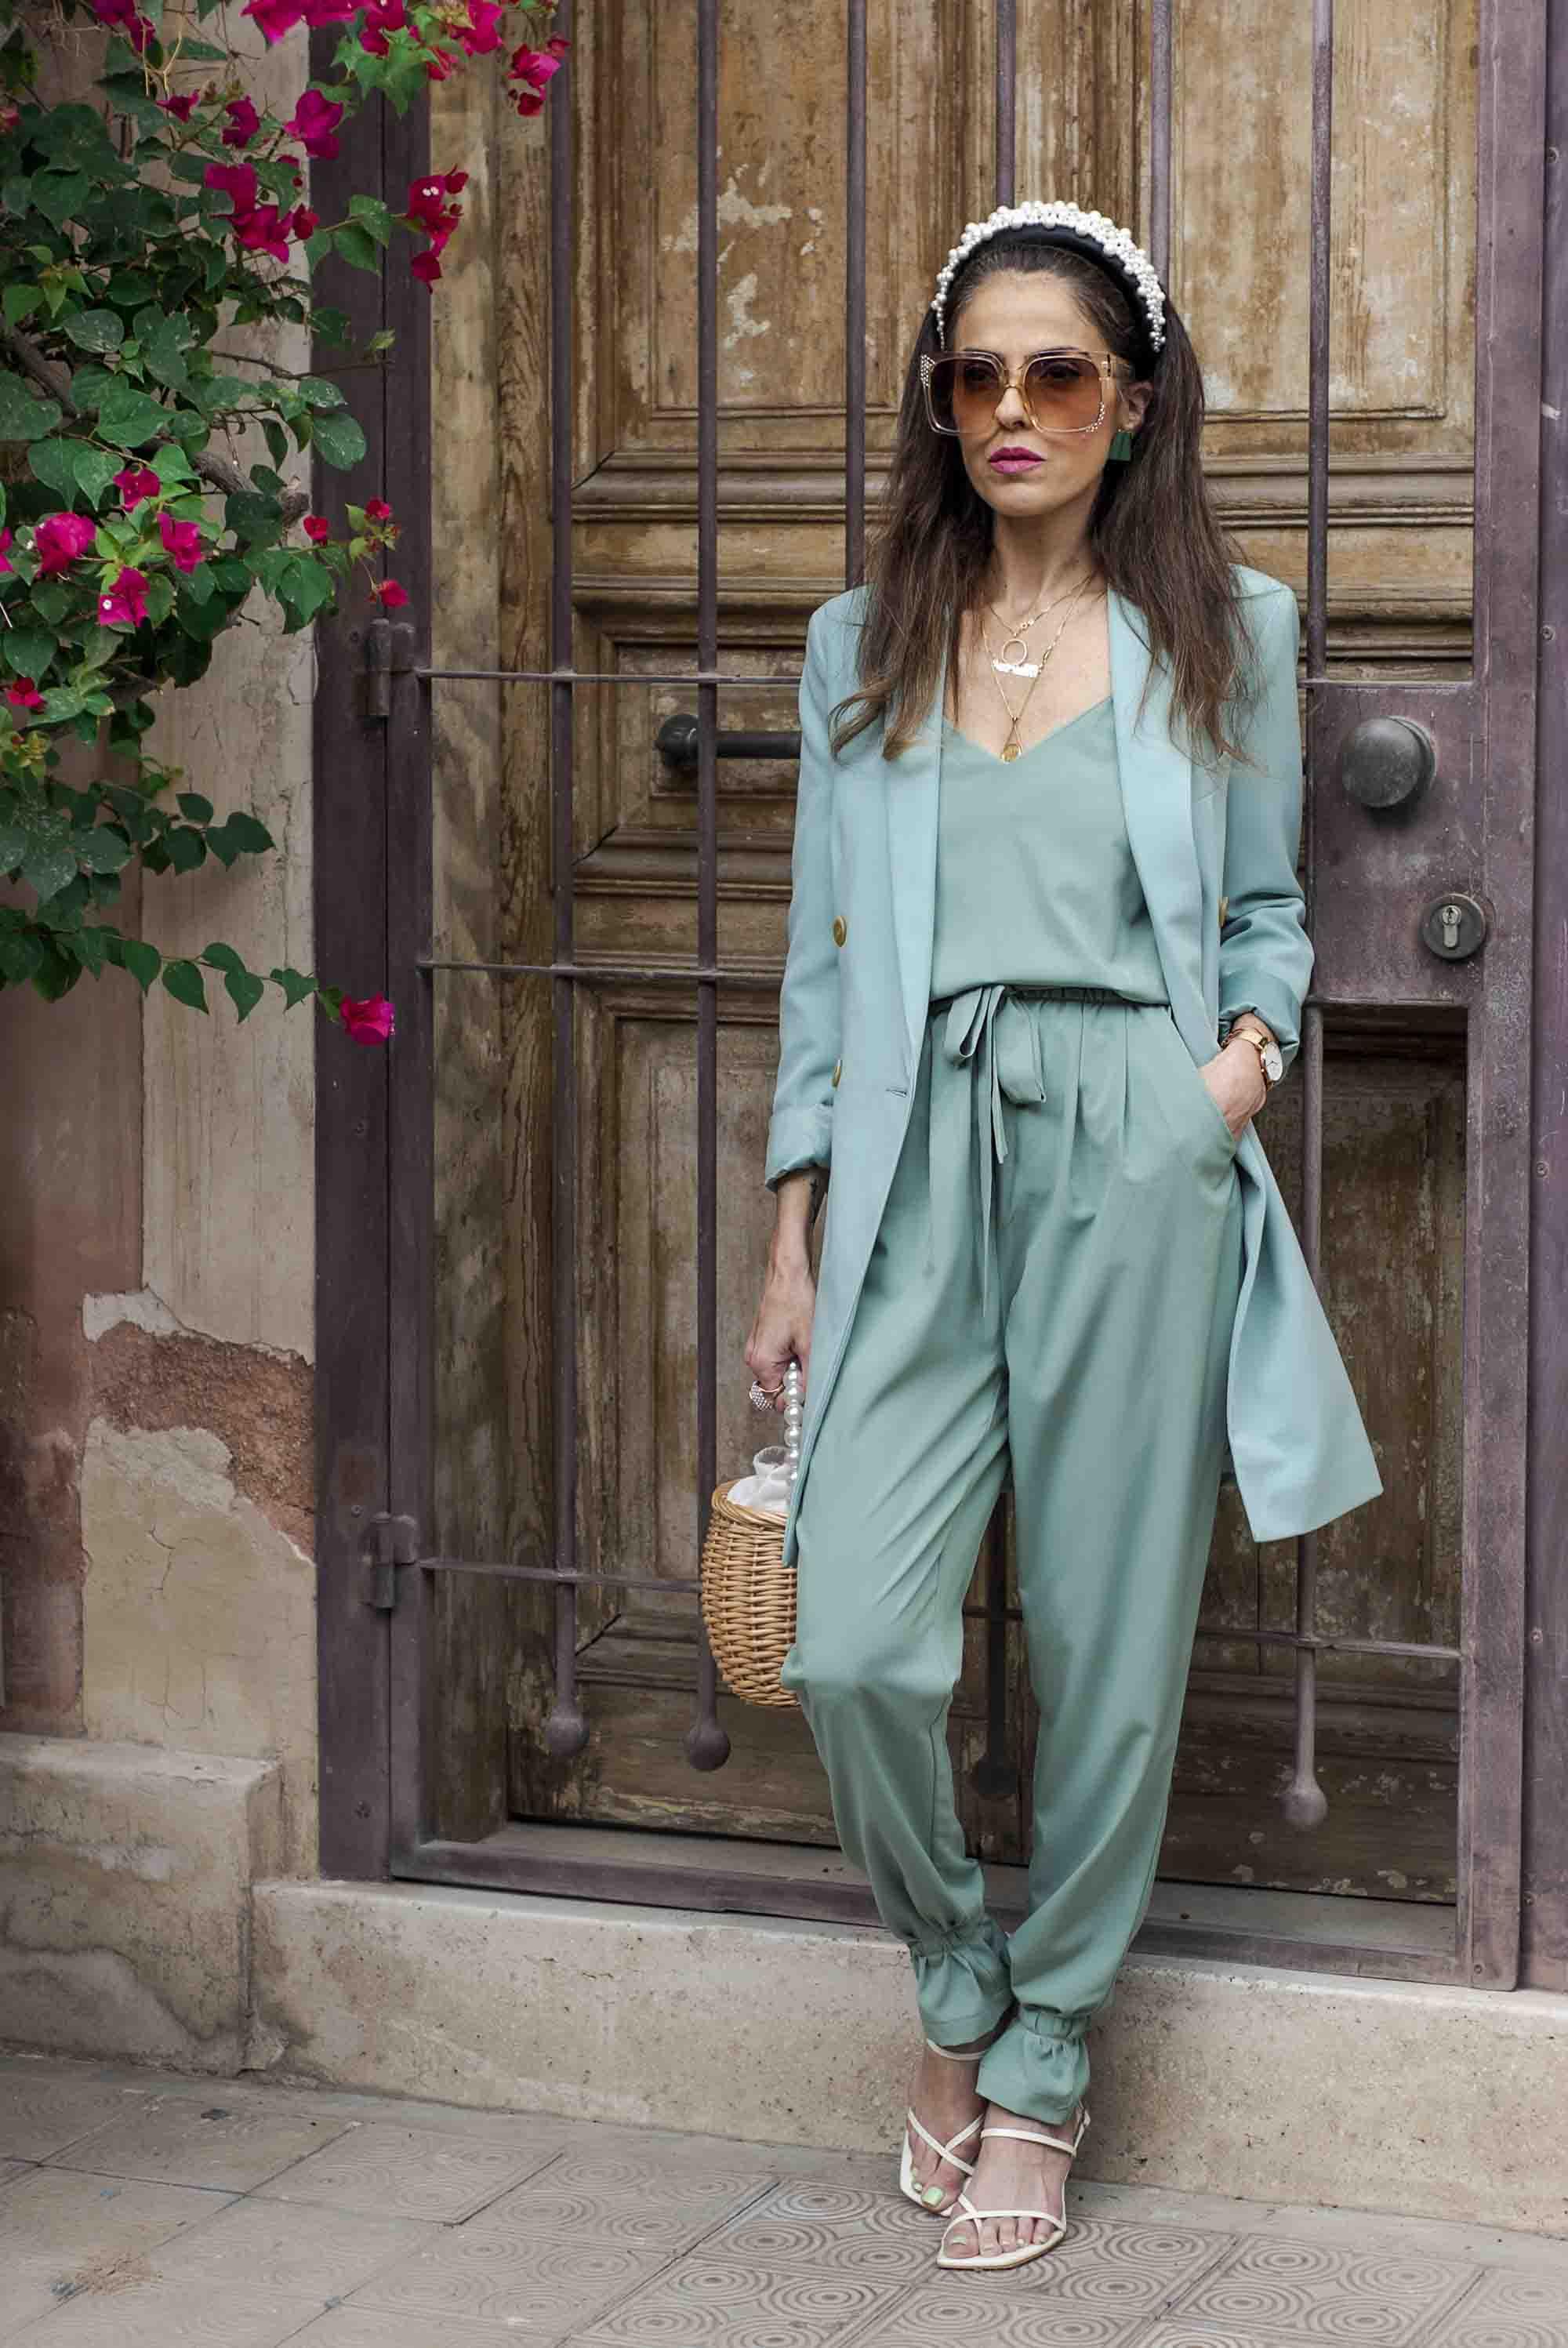 Fashion Israel-מגזין אופנה ישראלי, מירב רום, צילום לימור יערי - 2